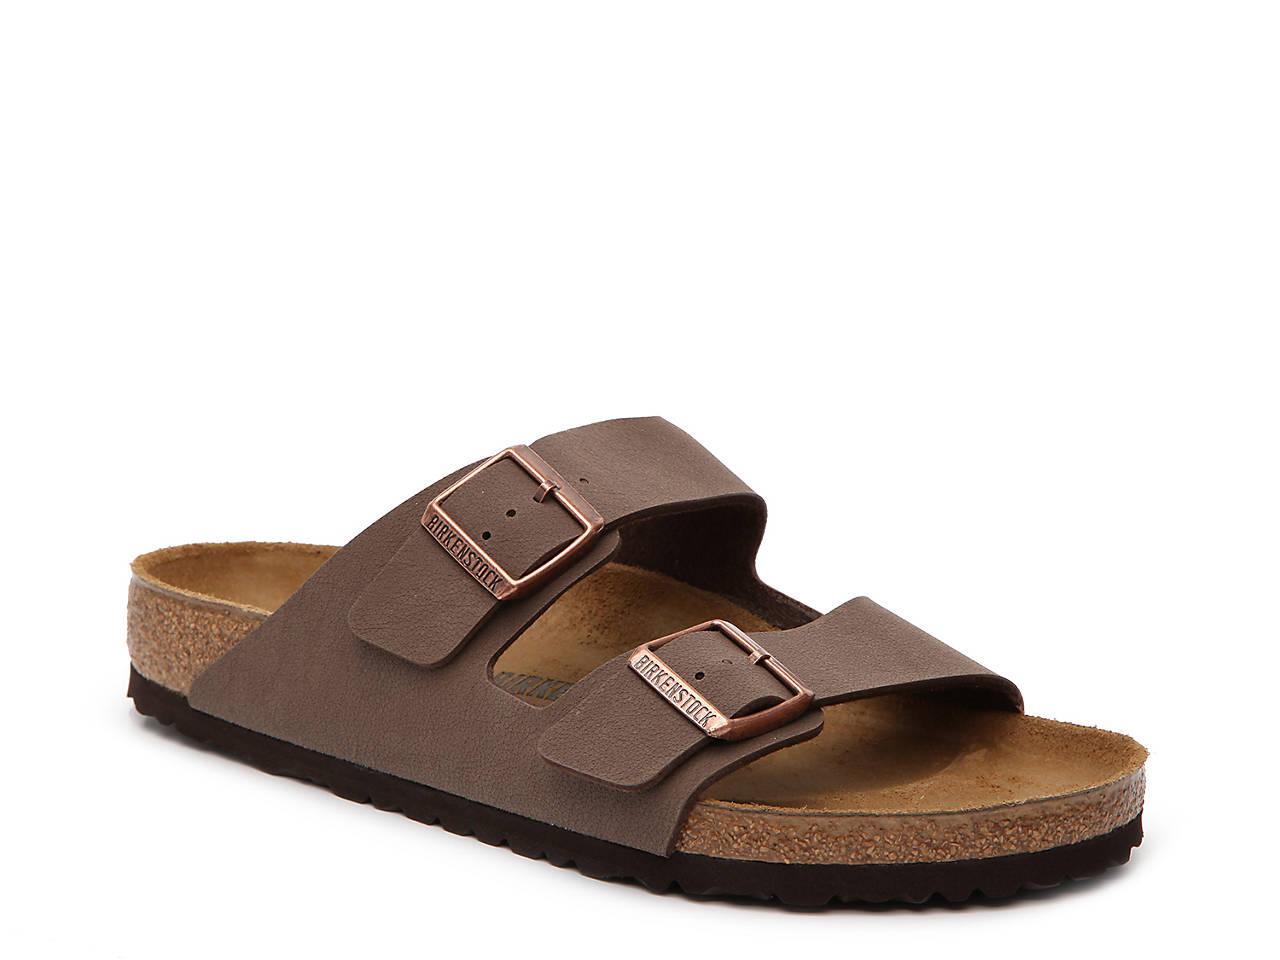 338dd2500667 Birkenstock Arizona Birko-Flor Slide Sandal - Men s Men s Shoes